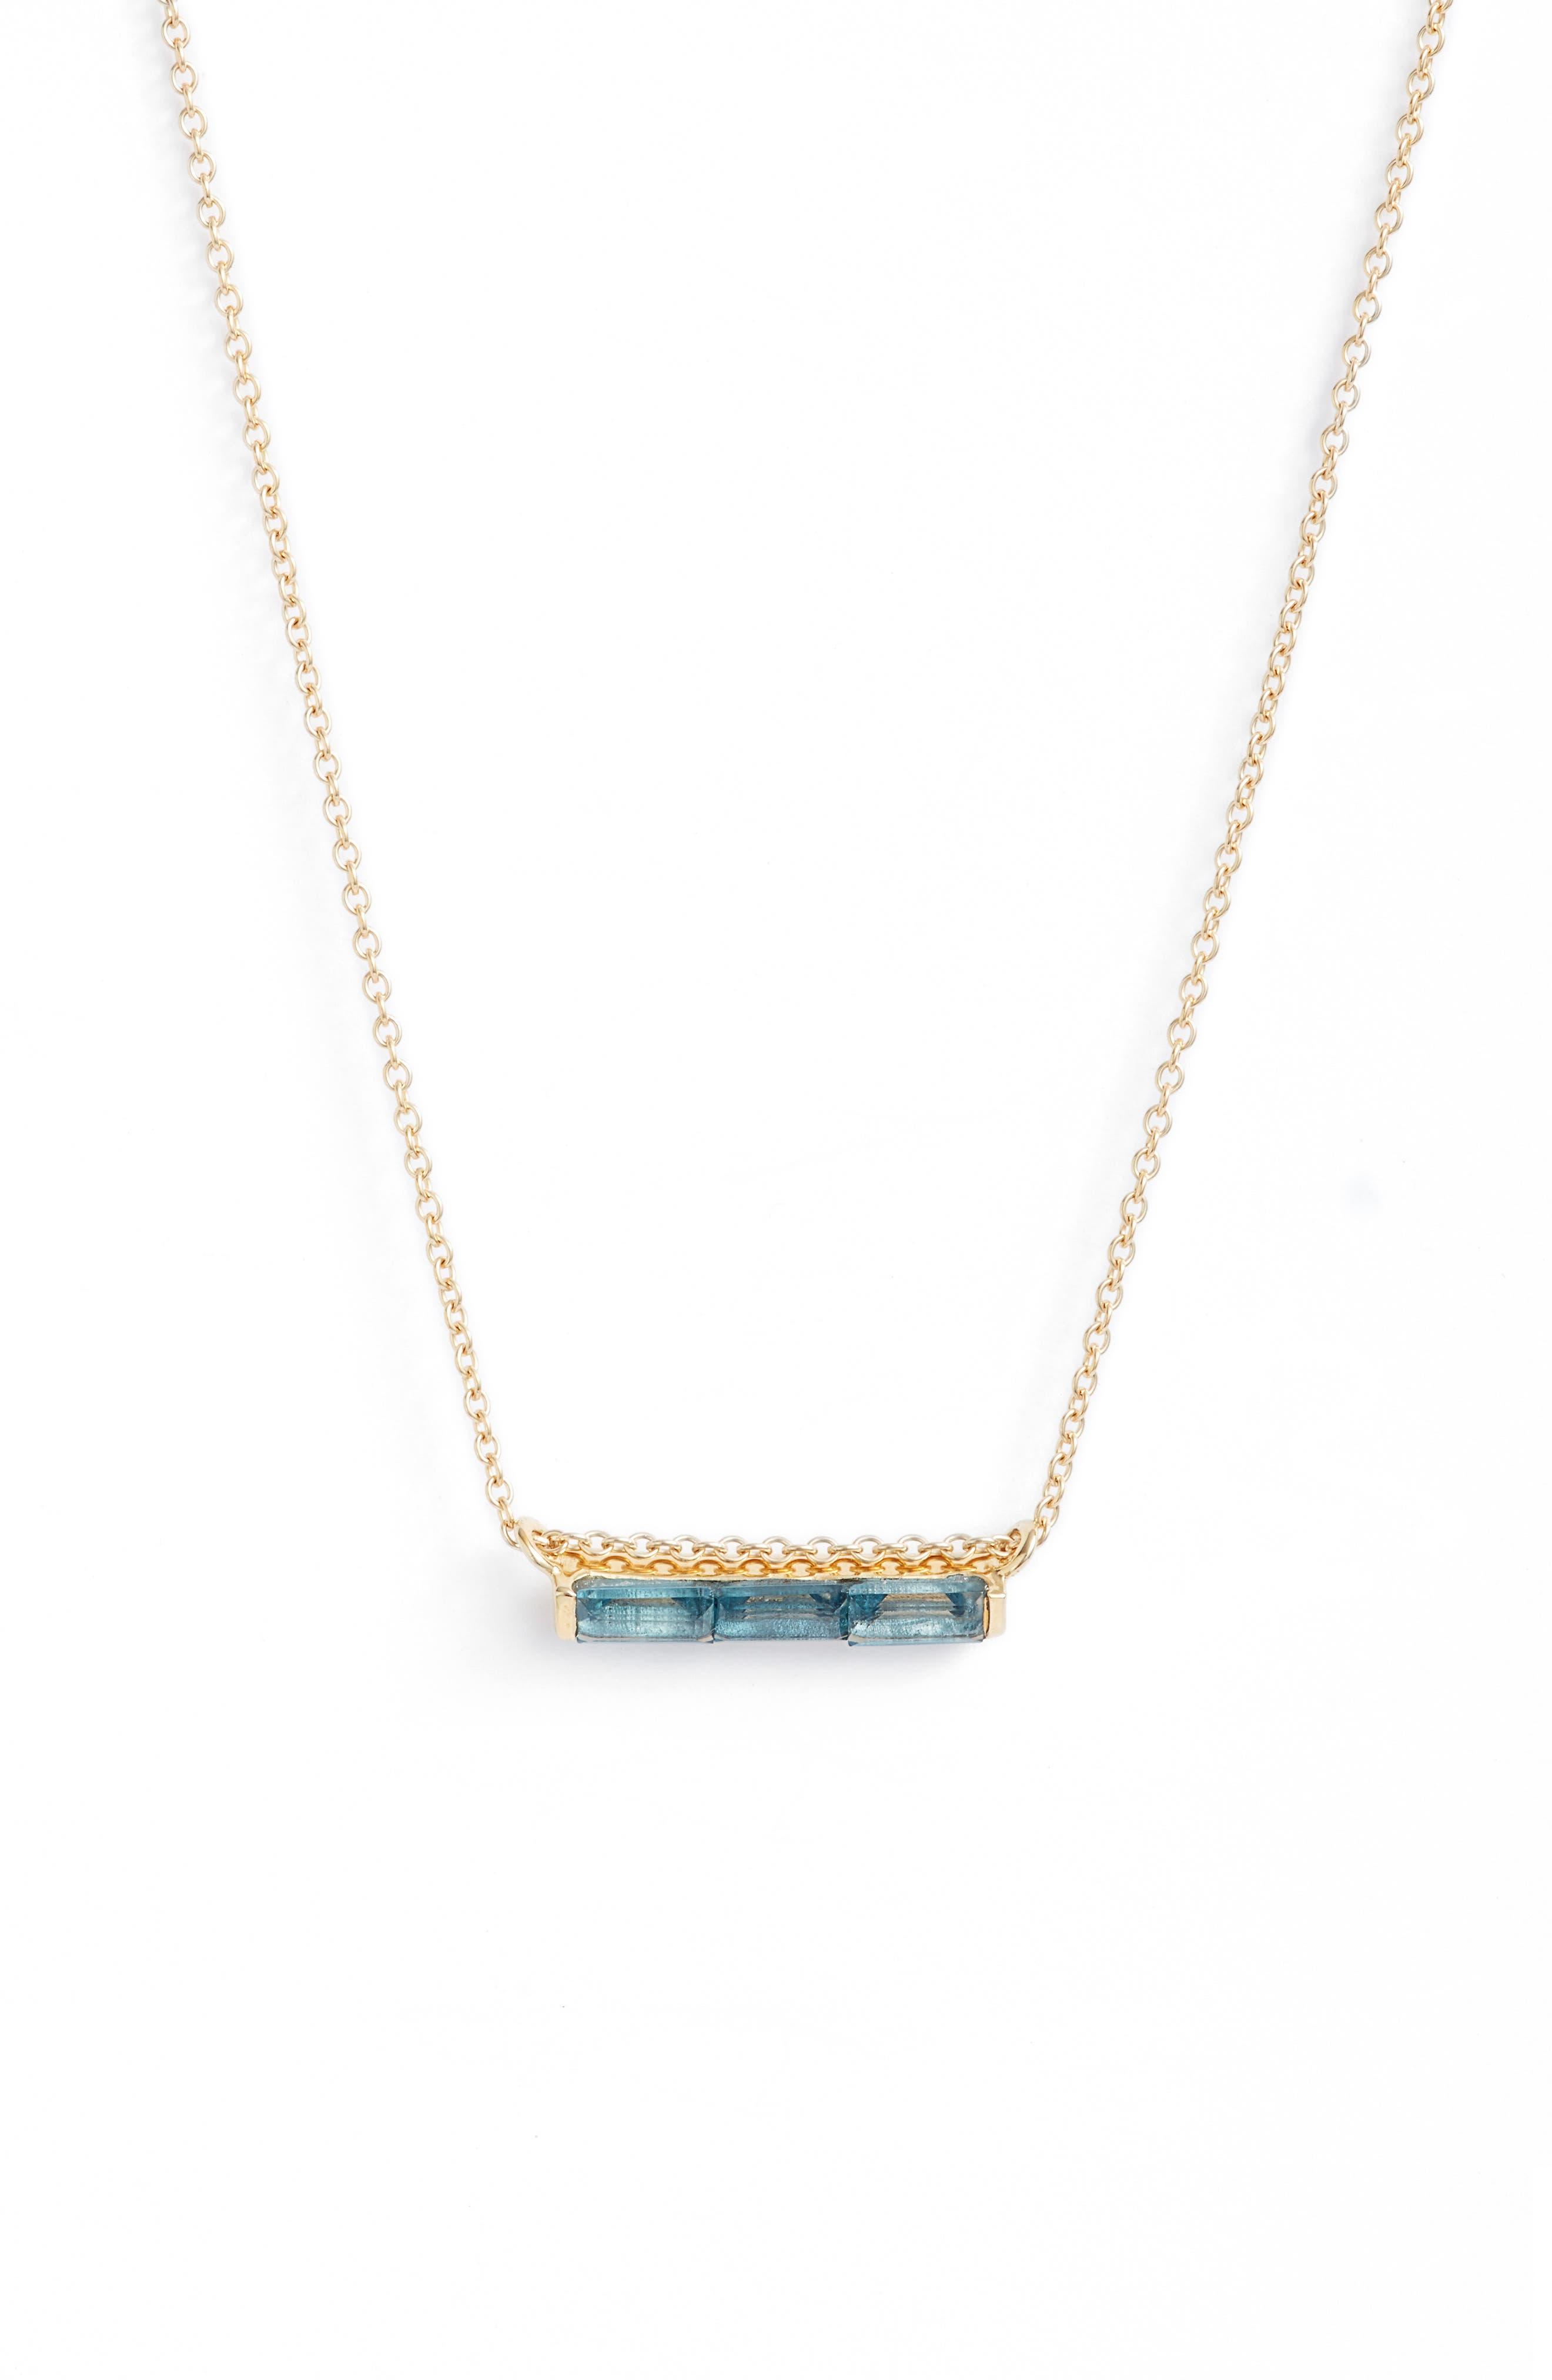 Channel Set Semiprecious Stone Necklace,                             Main thumbnail 2, color,